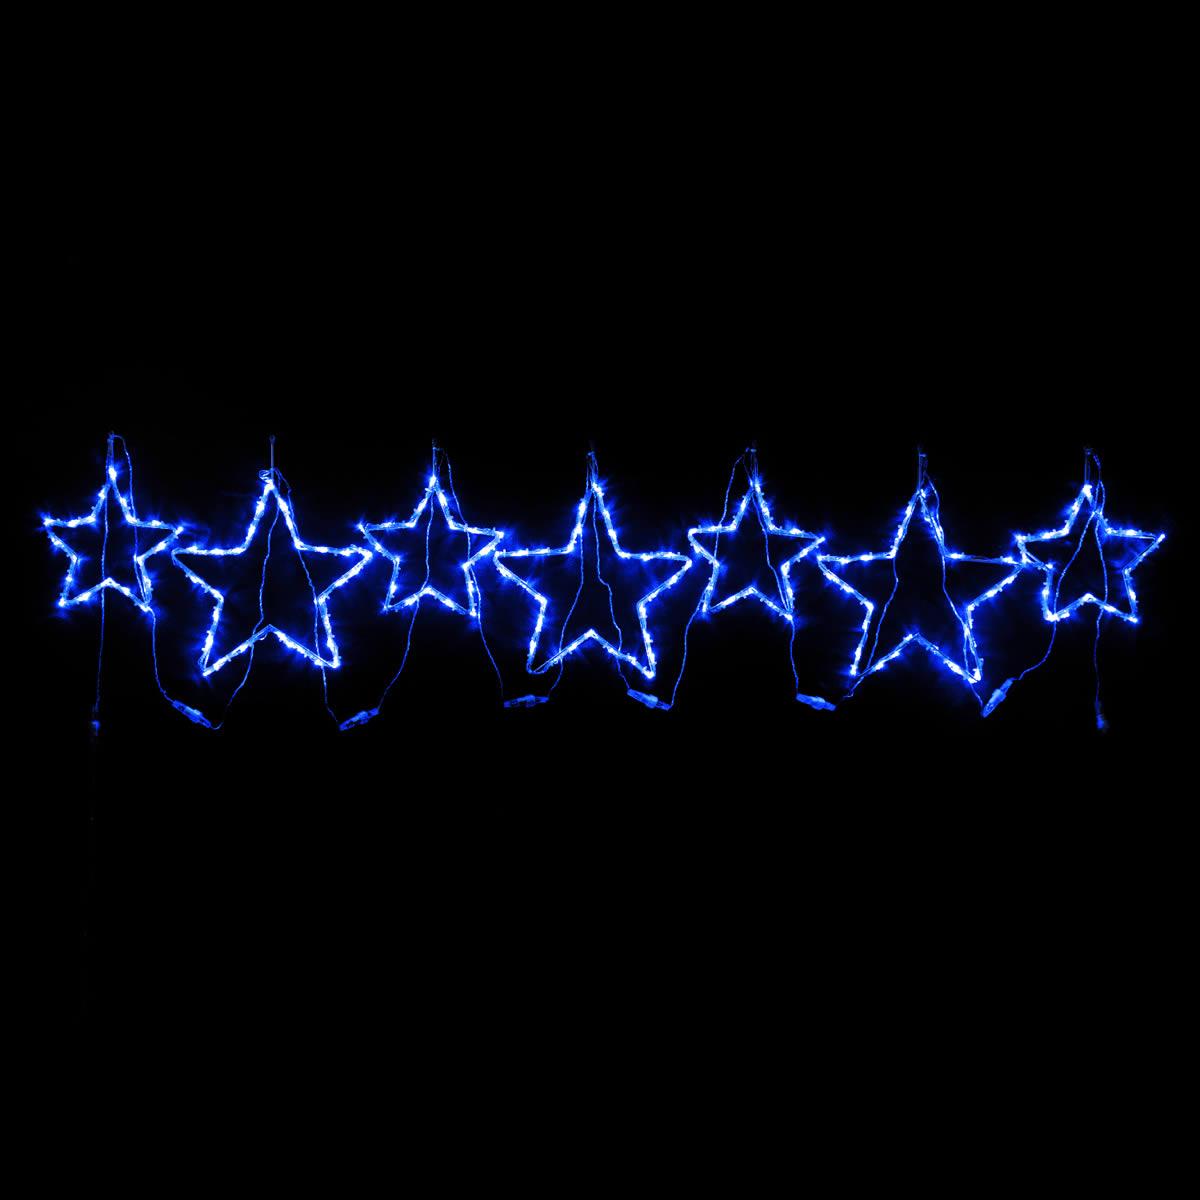 Blue Star Motif set of 7